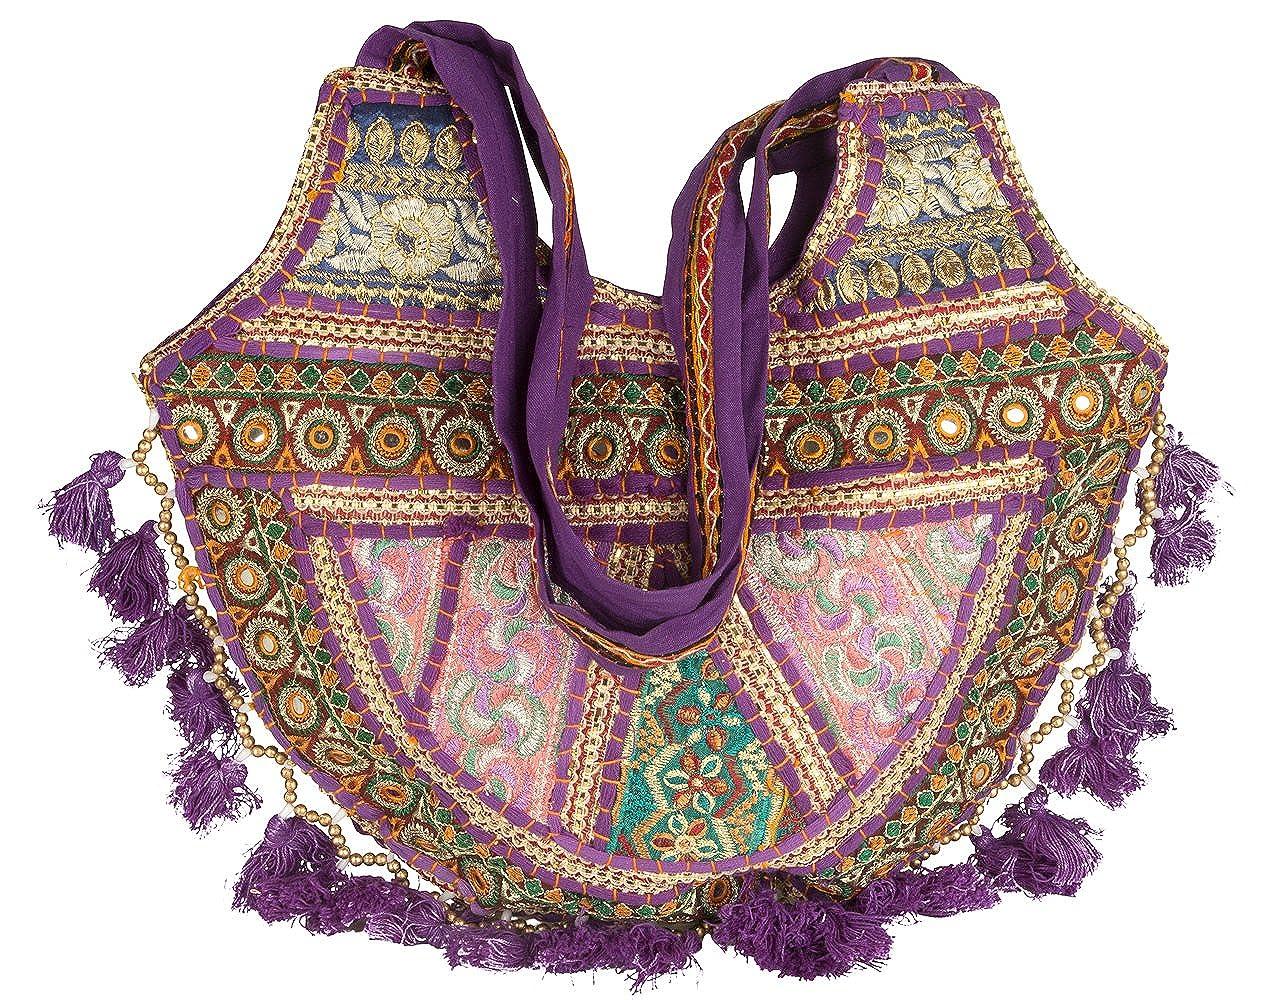 93c406548e Amazon.com  Tribe Azure Women Medium Shoulder Bag Tote Colorful Roomy  Casual Boho Purse Travel Beach Top Handle Tassel Bright (Magenta)  Shoes